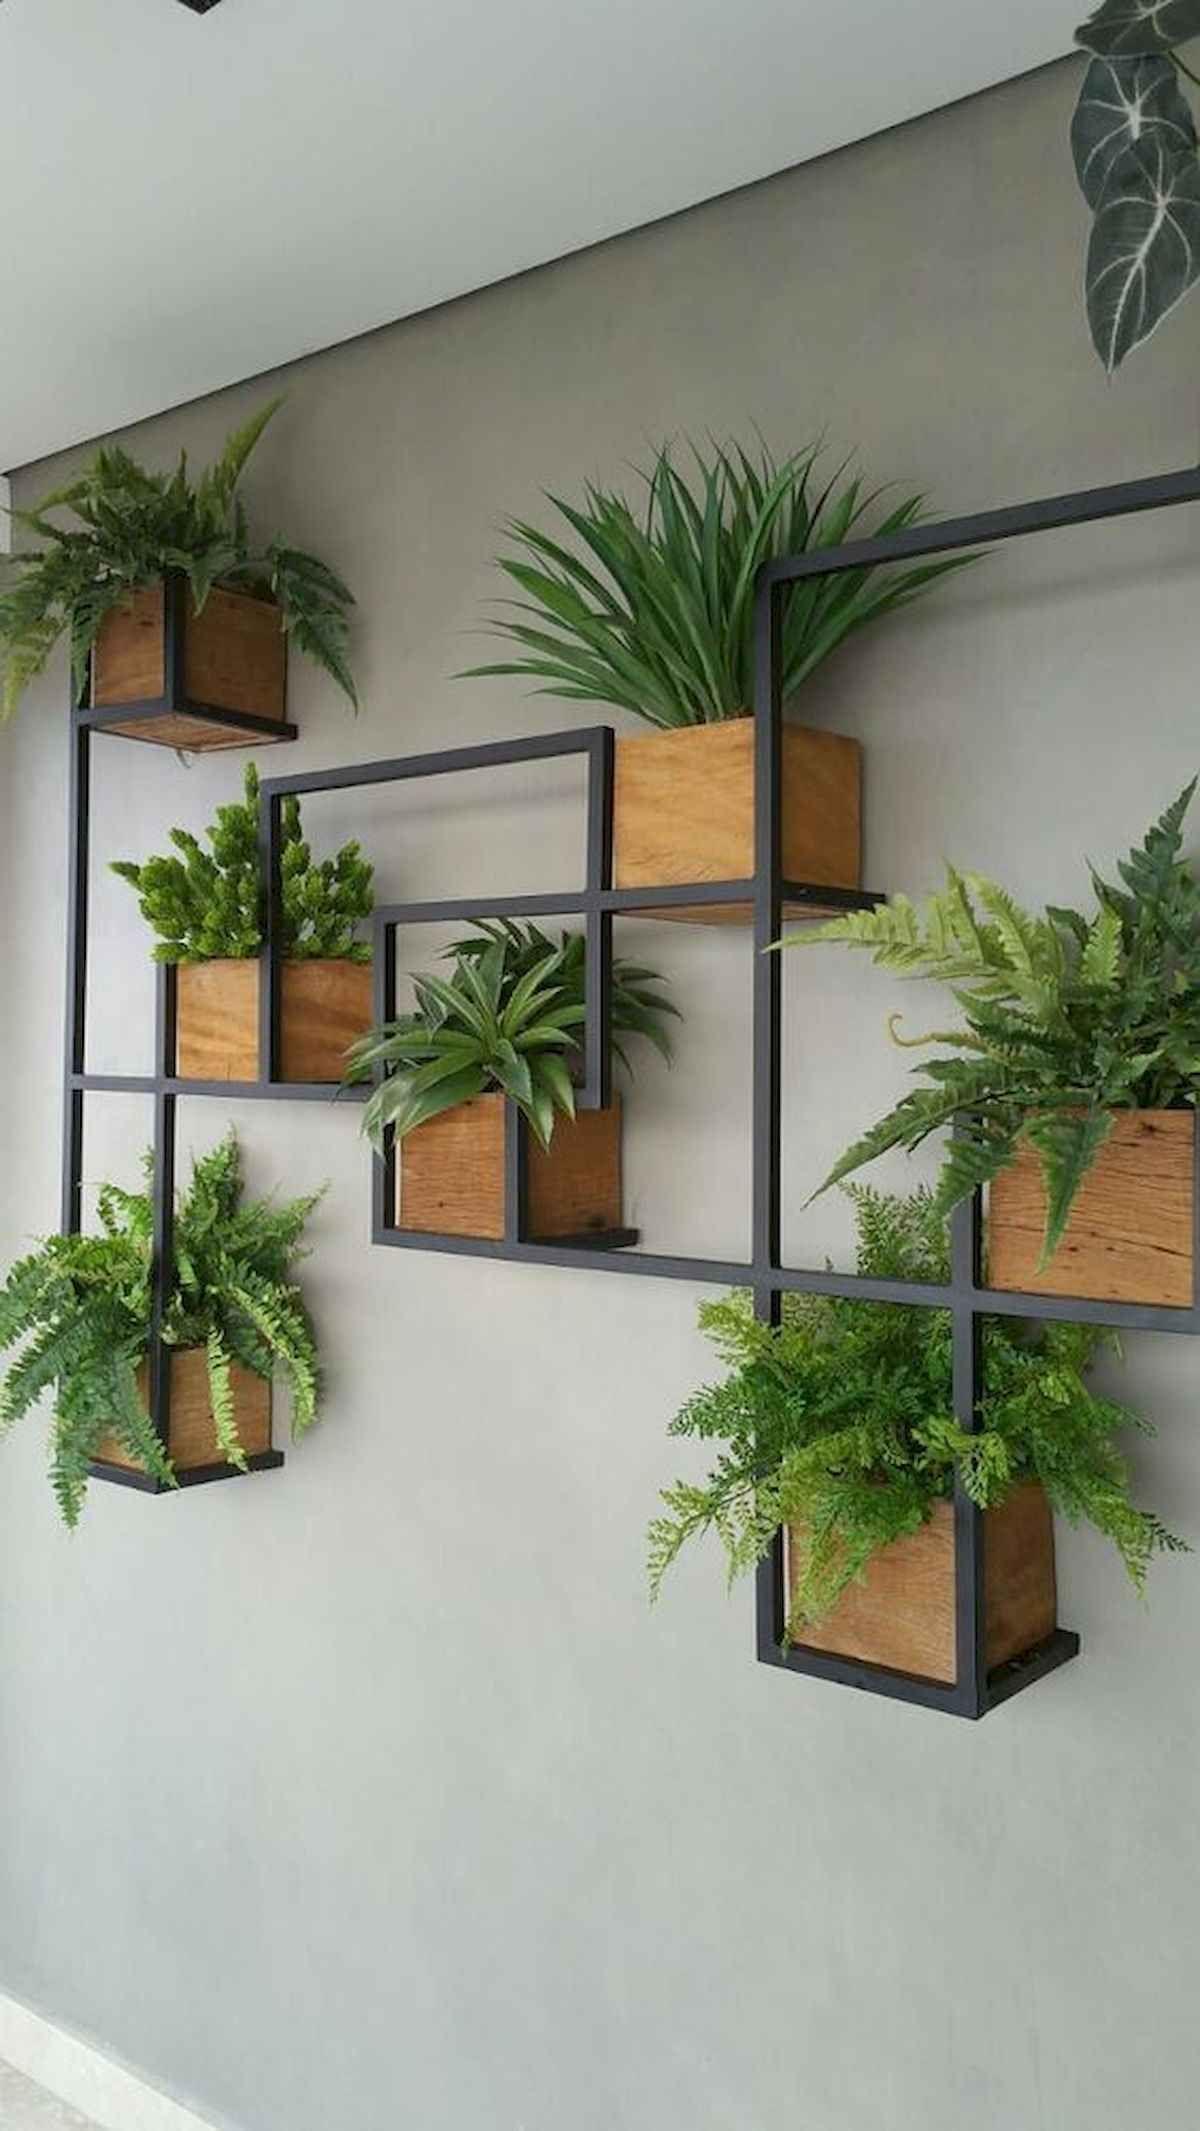 50 Best Indoor Garden For Apartment Design Ideas And Remodel 47 Coachdecor Com Vertical Garden Diy Vertical Garden Design House Plants Decor